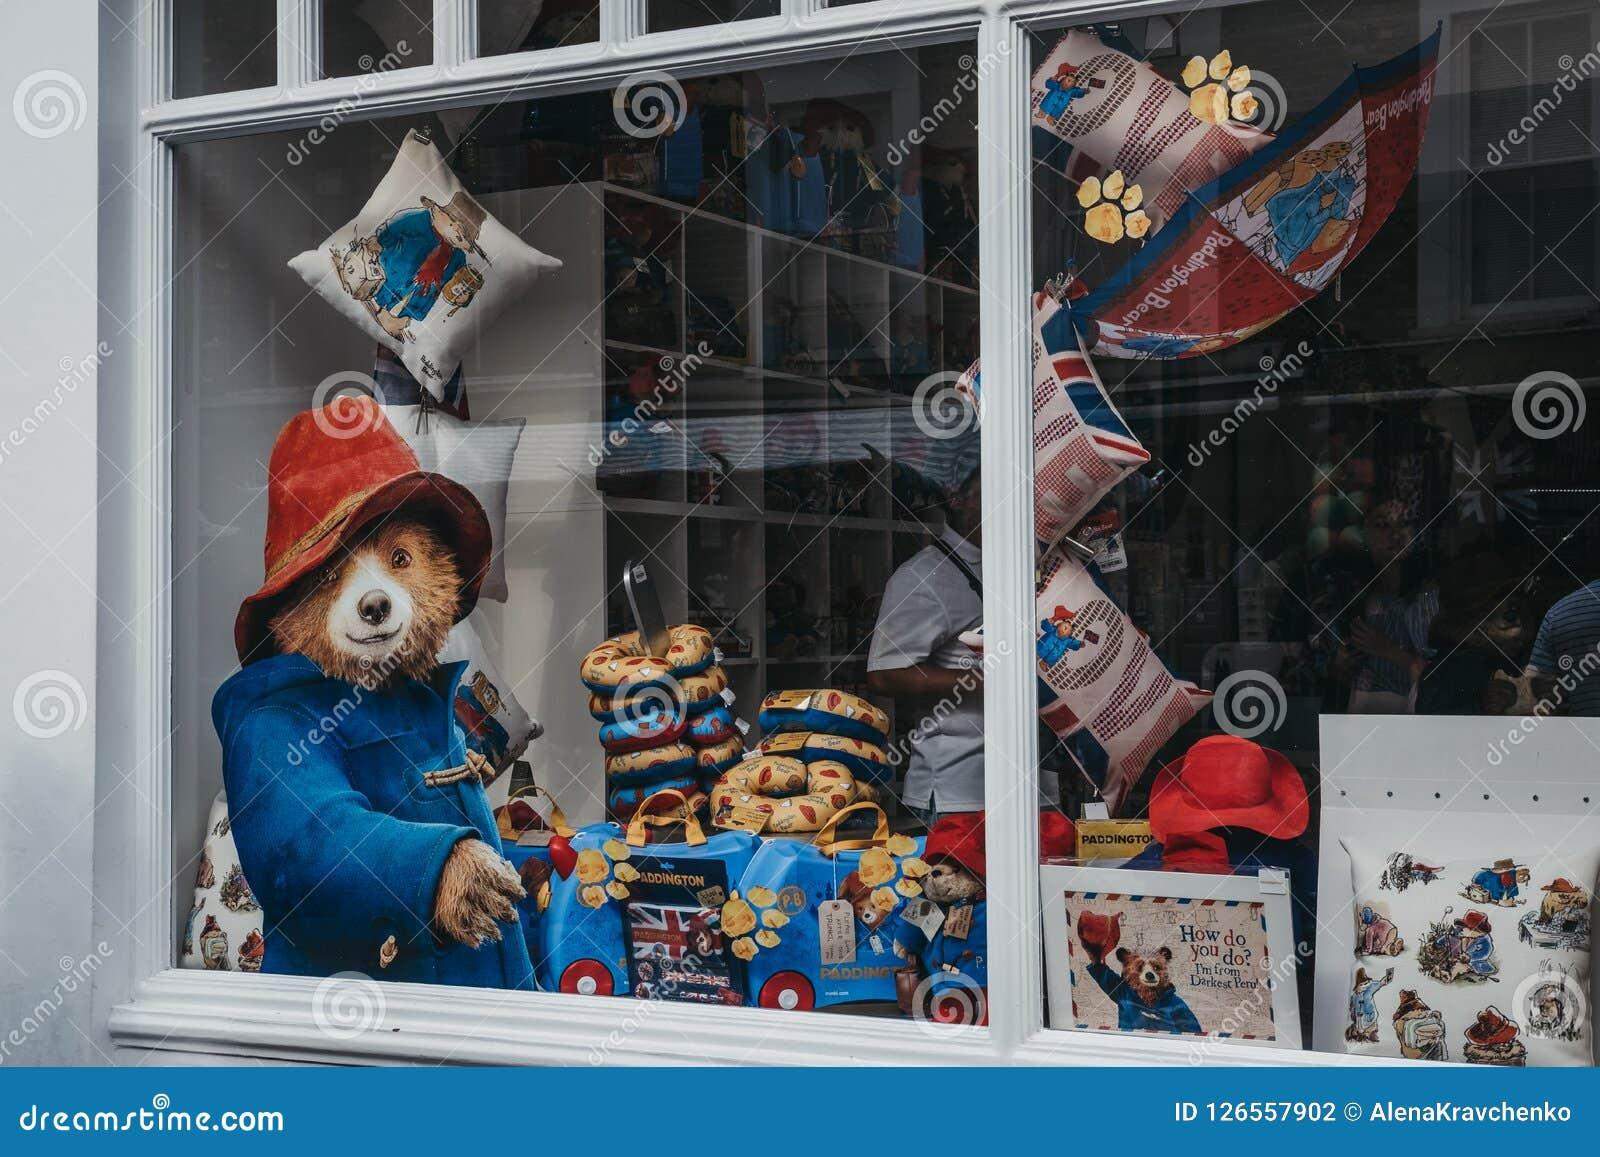 Ventana de la tienda móvil de Paddington en el camino de Portobello, Londres, Reino Unido